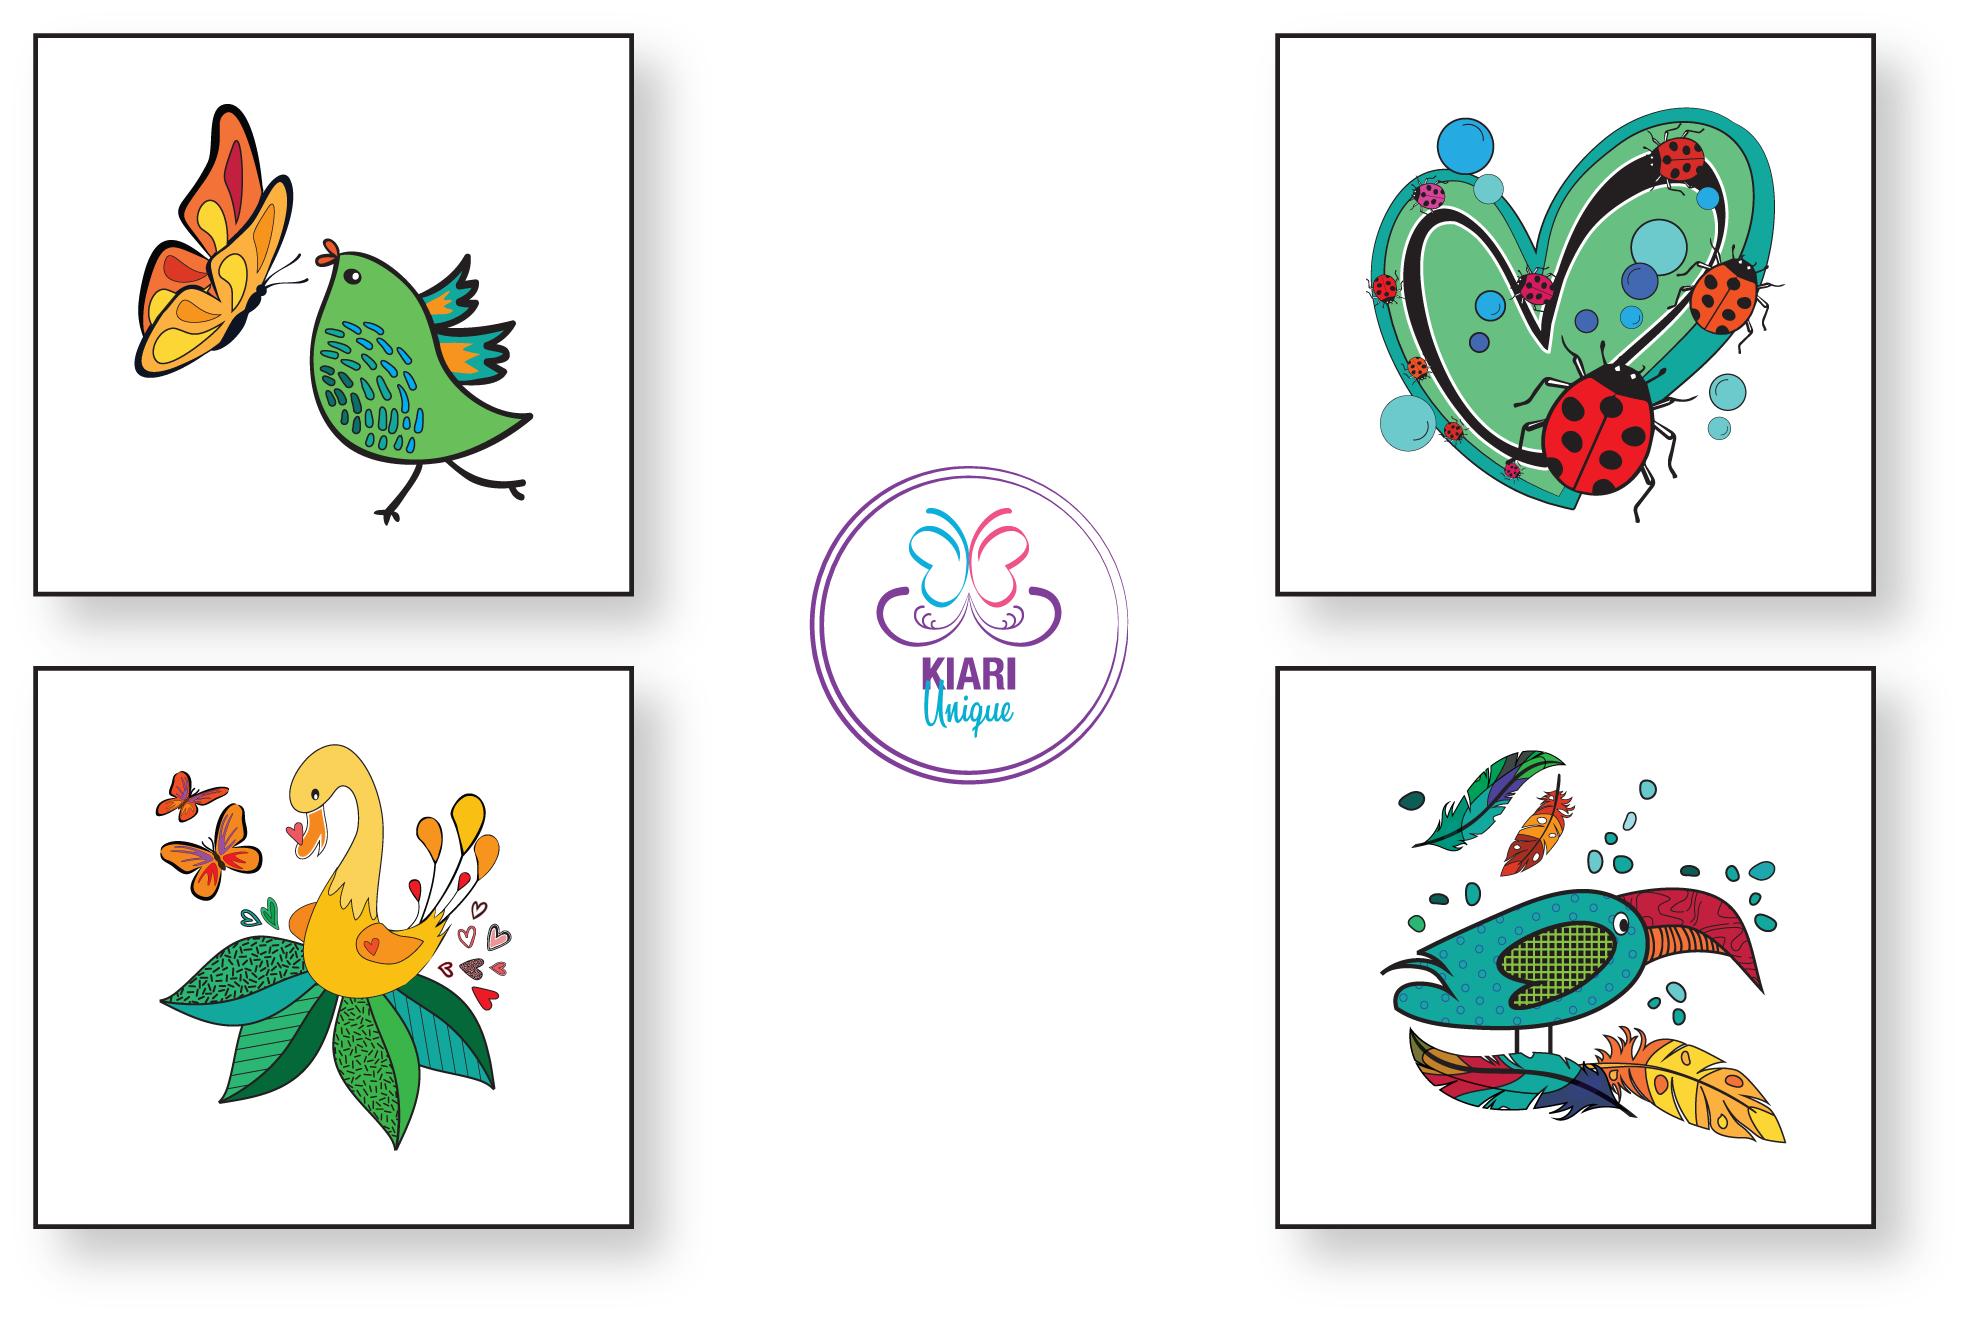 Kiara stickers